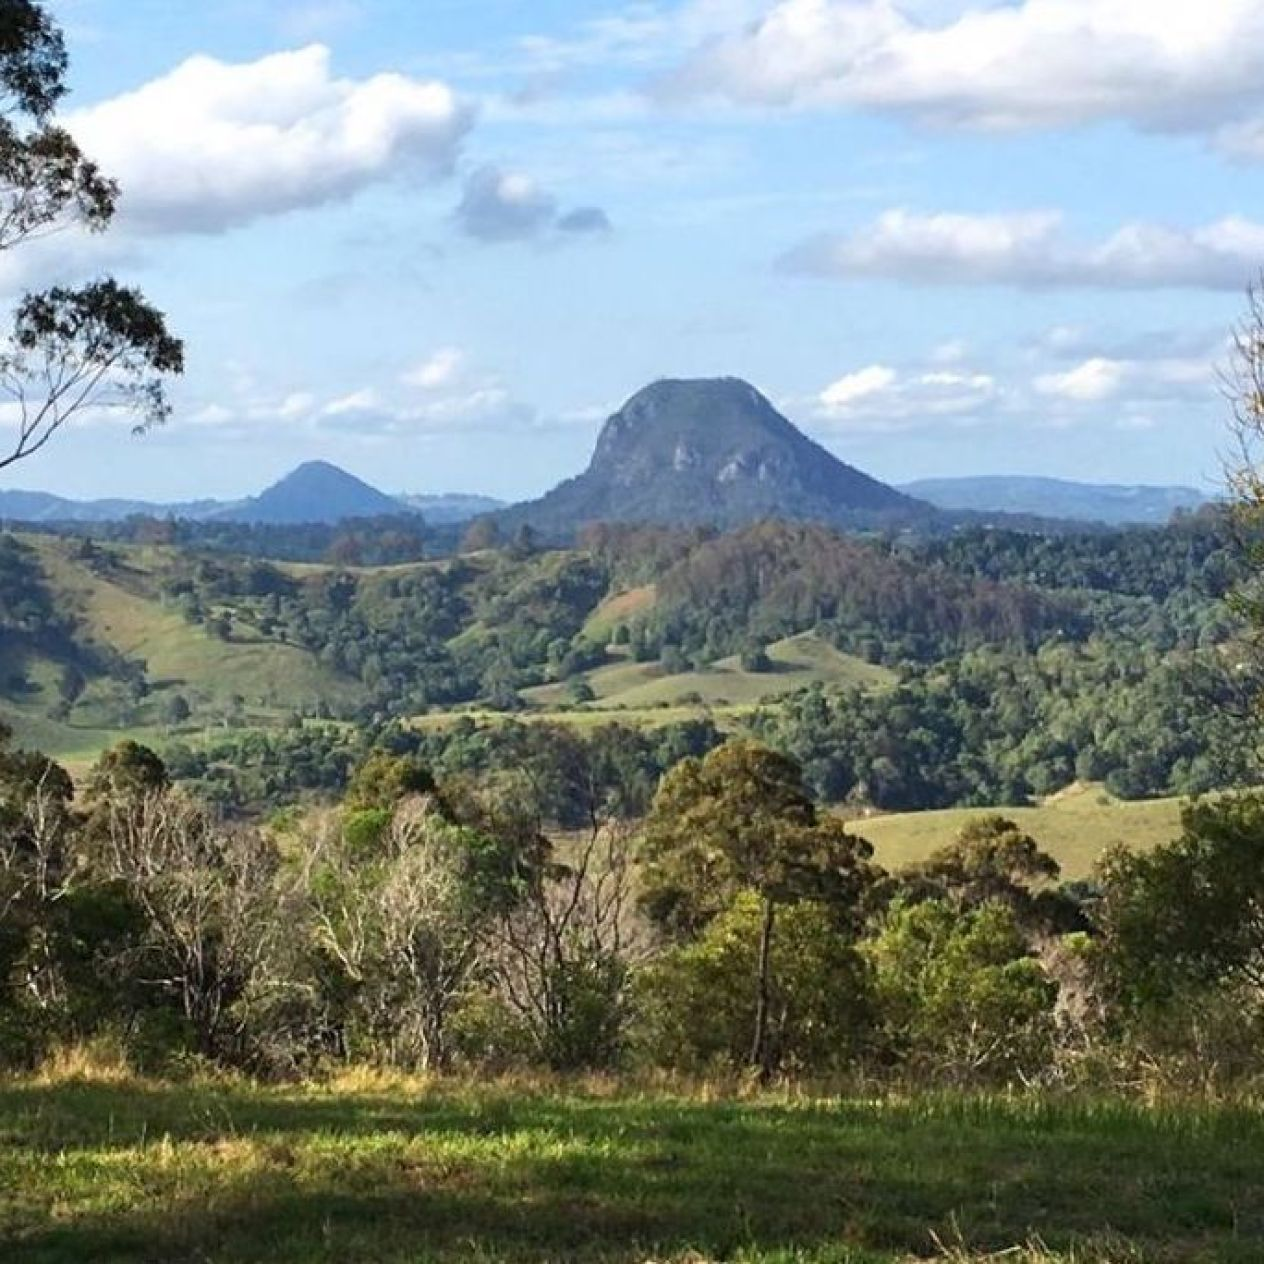 FAV view from Black Mountain overlooking Noosa Hinterland